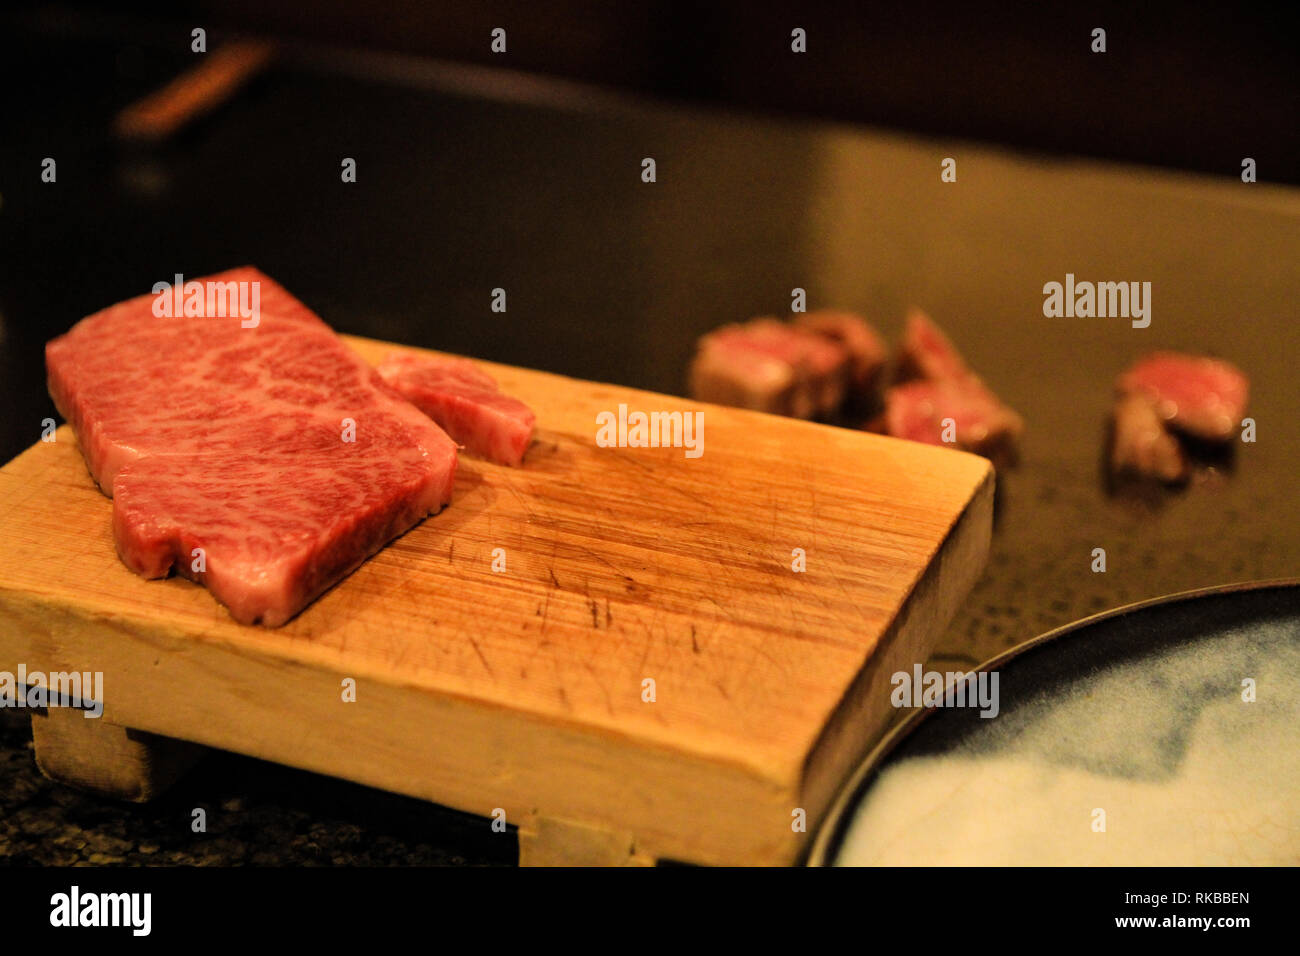 Kobe Beef Stock Photos & Kobe Beef Stock Images - Alamy